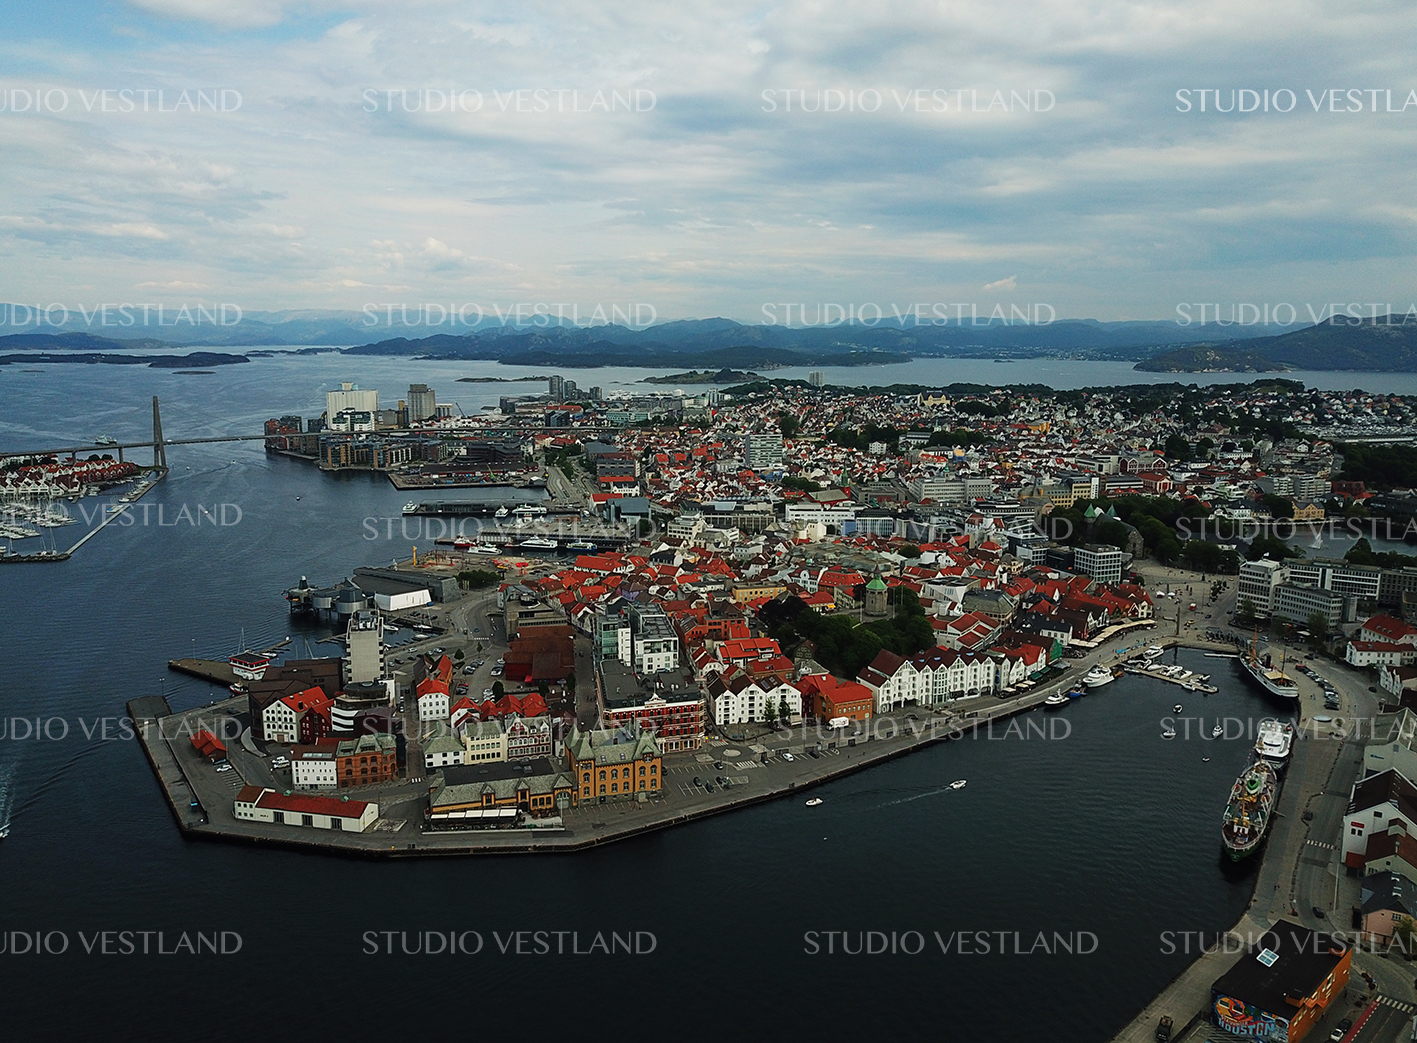 Studio Vestland - Stavanger 27